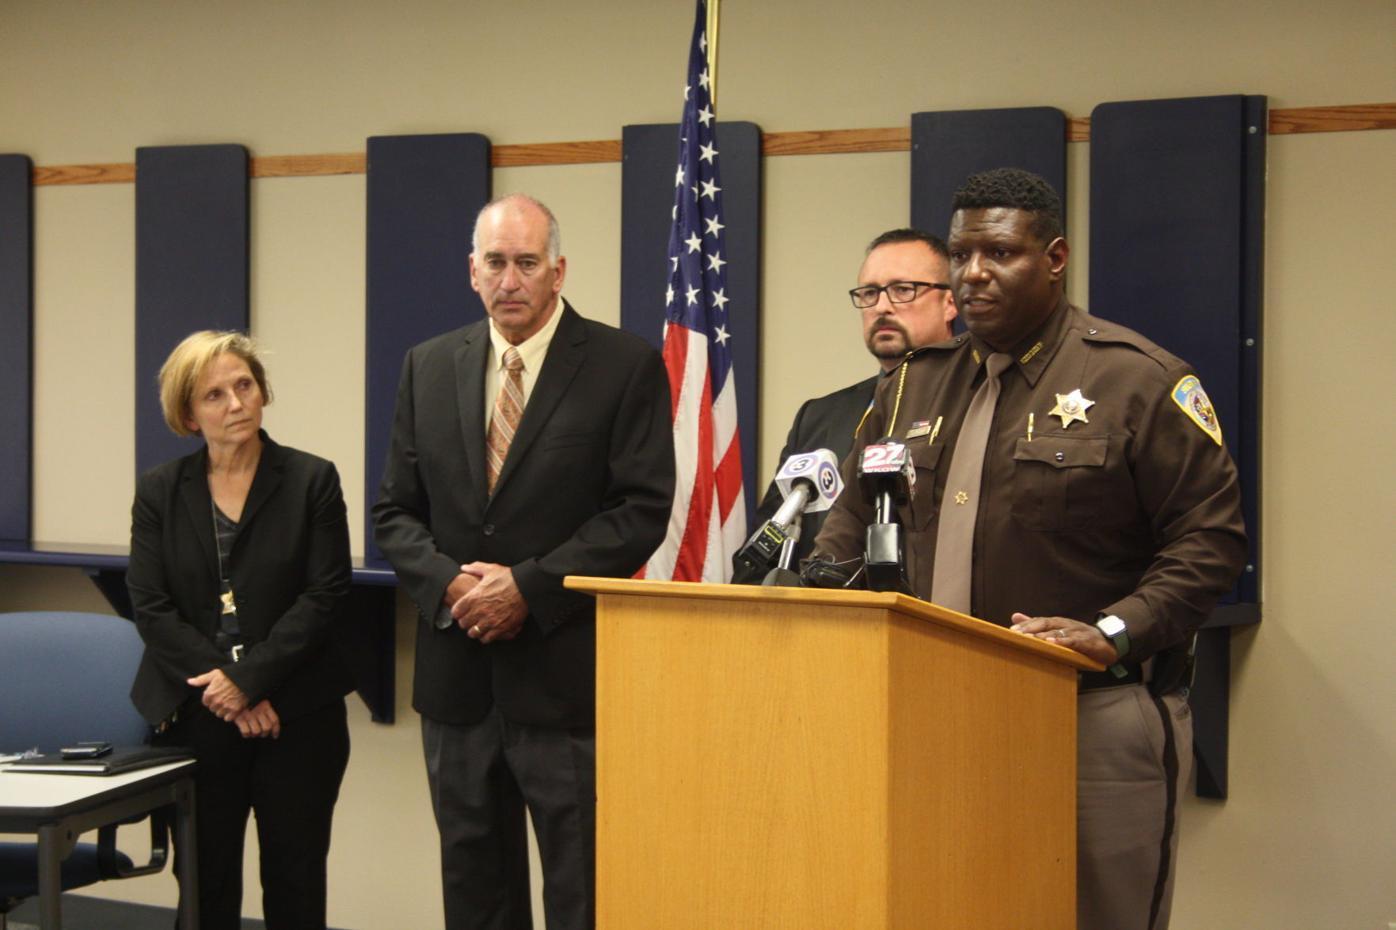 Dane County Sheriff Windsor Press Conference